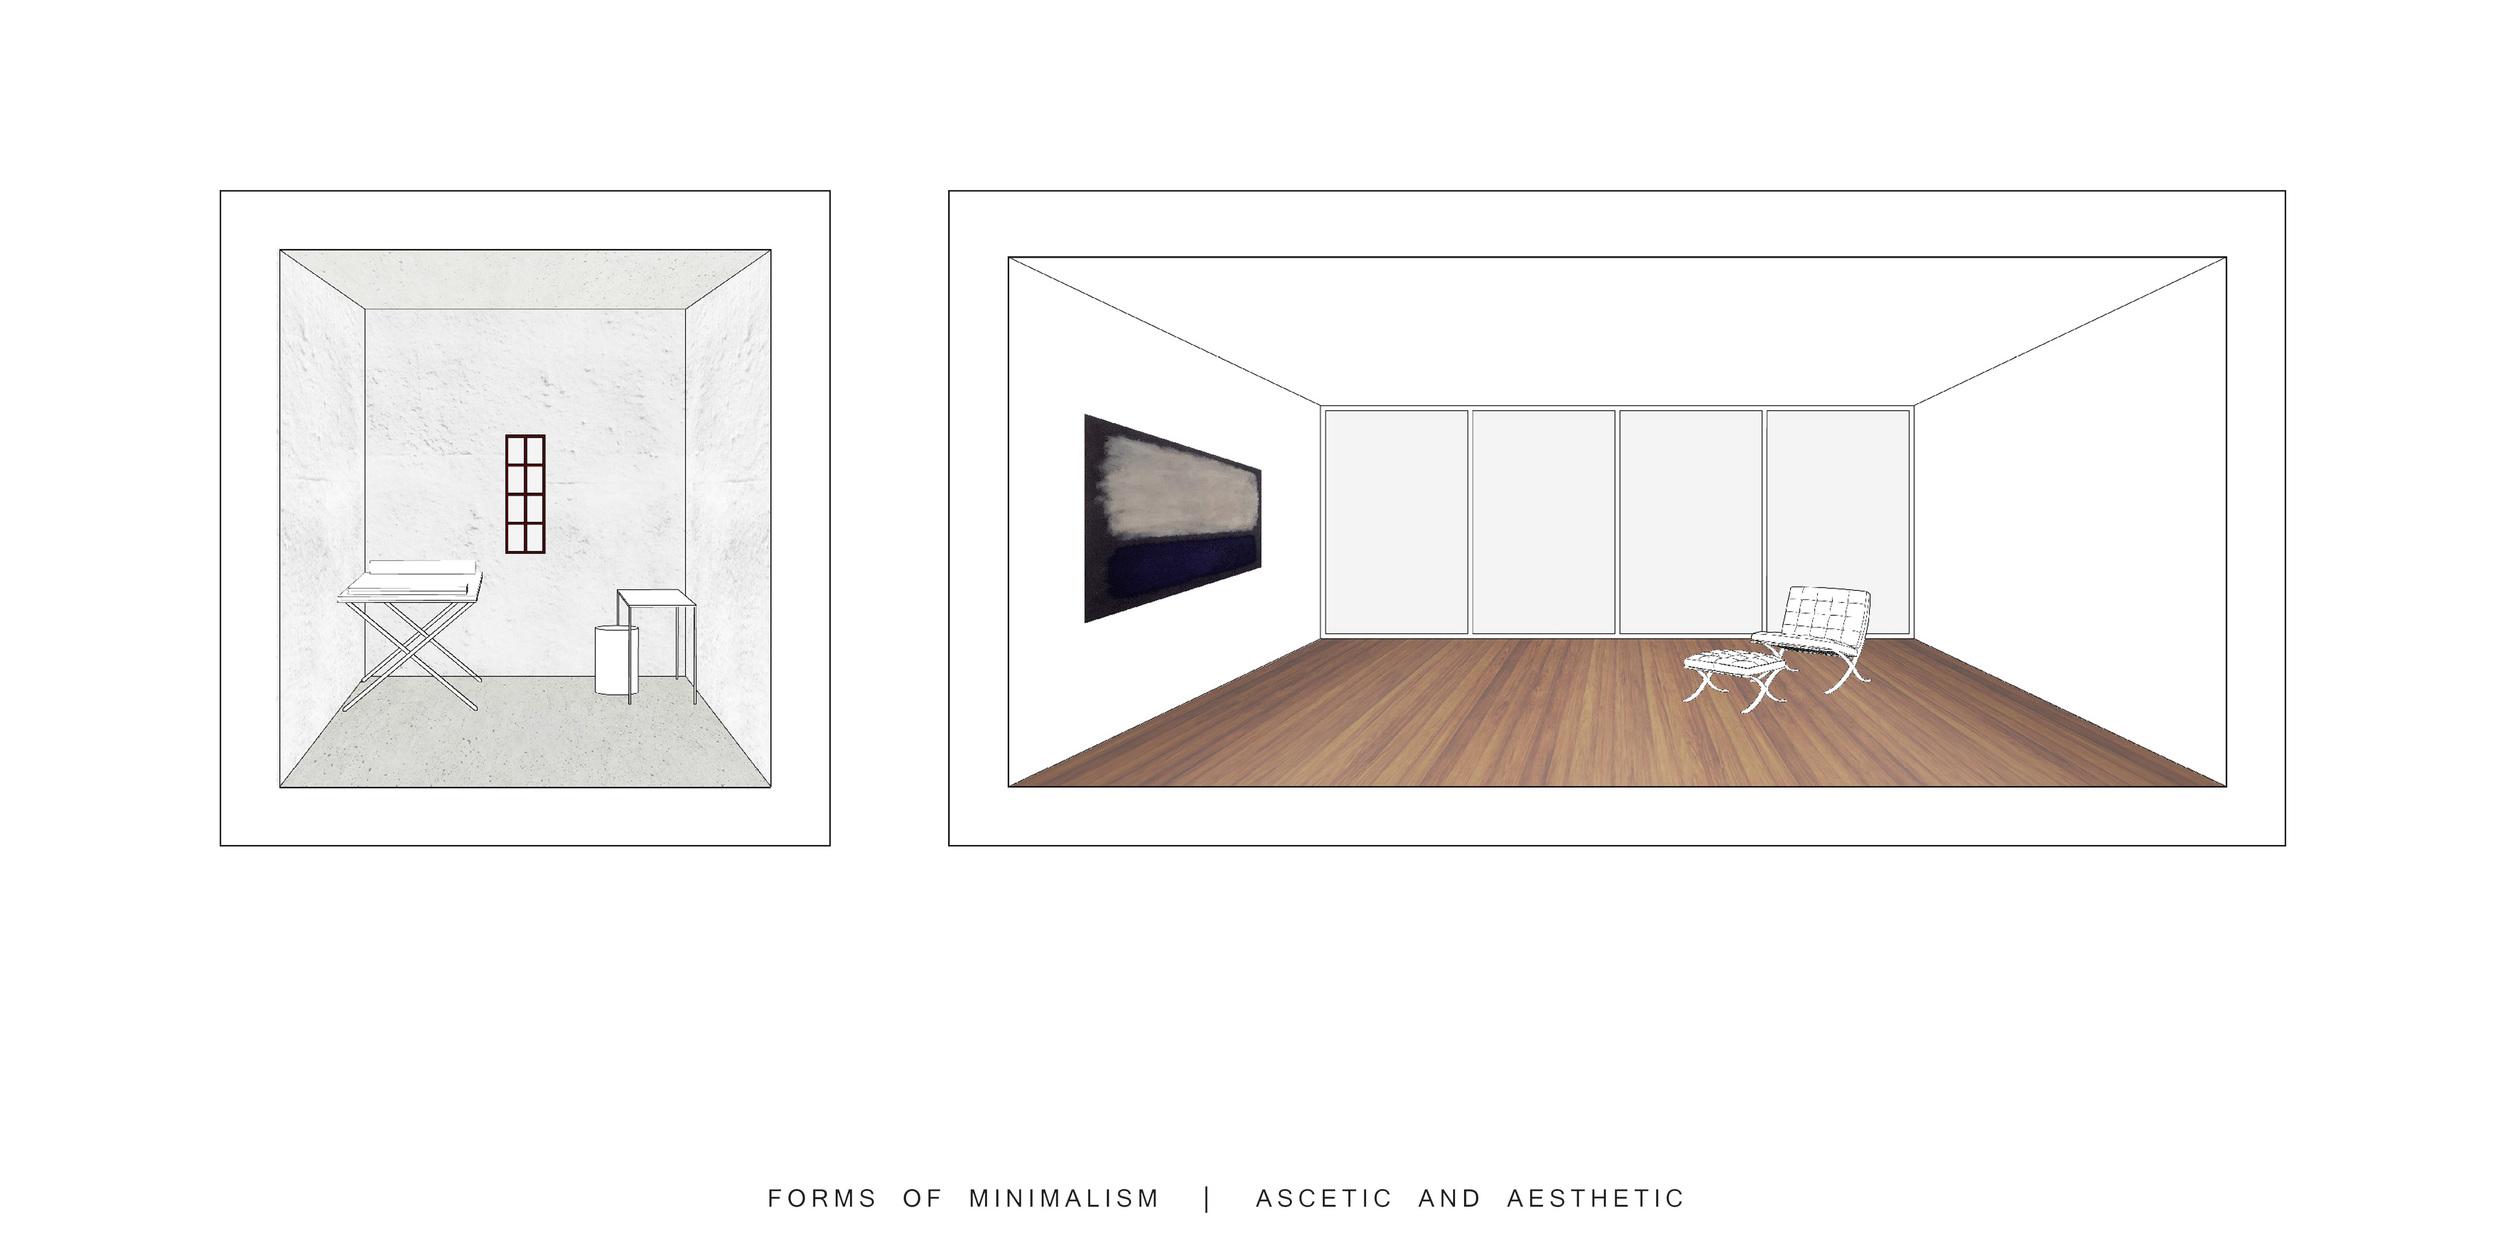 forms-of-minimalism.jpg